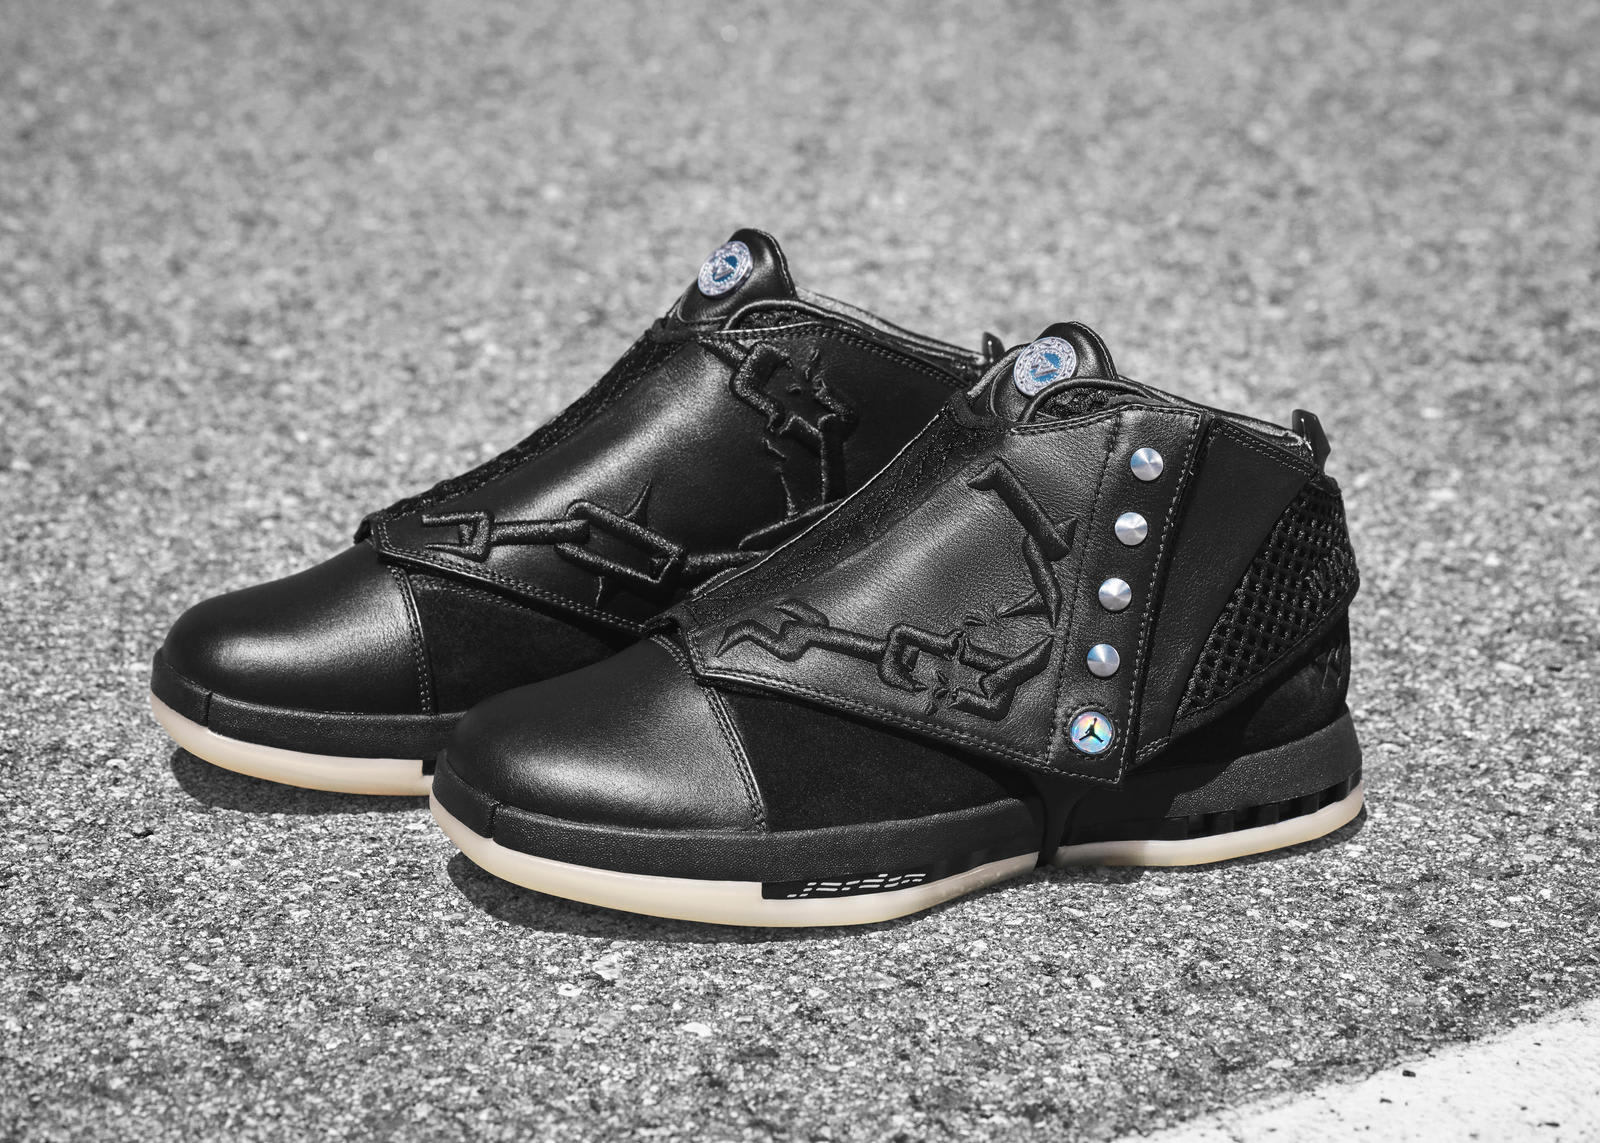 Air Jordan 16 x Converse 'Why Not?' Pack Pair